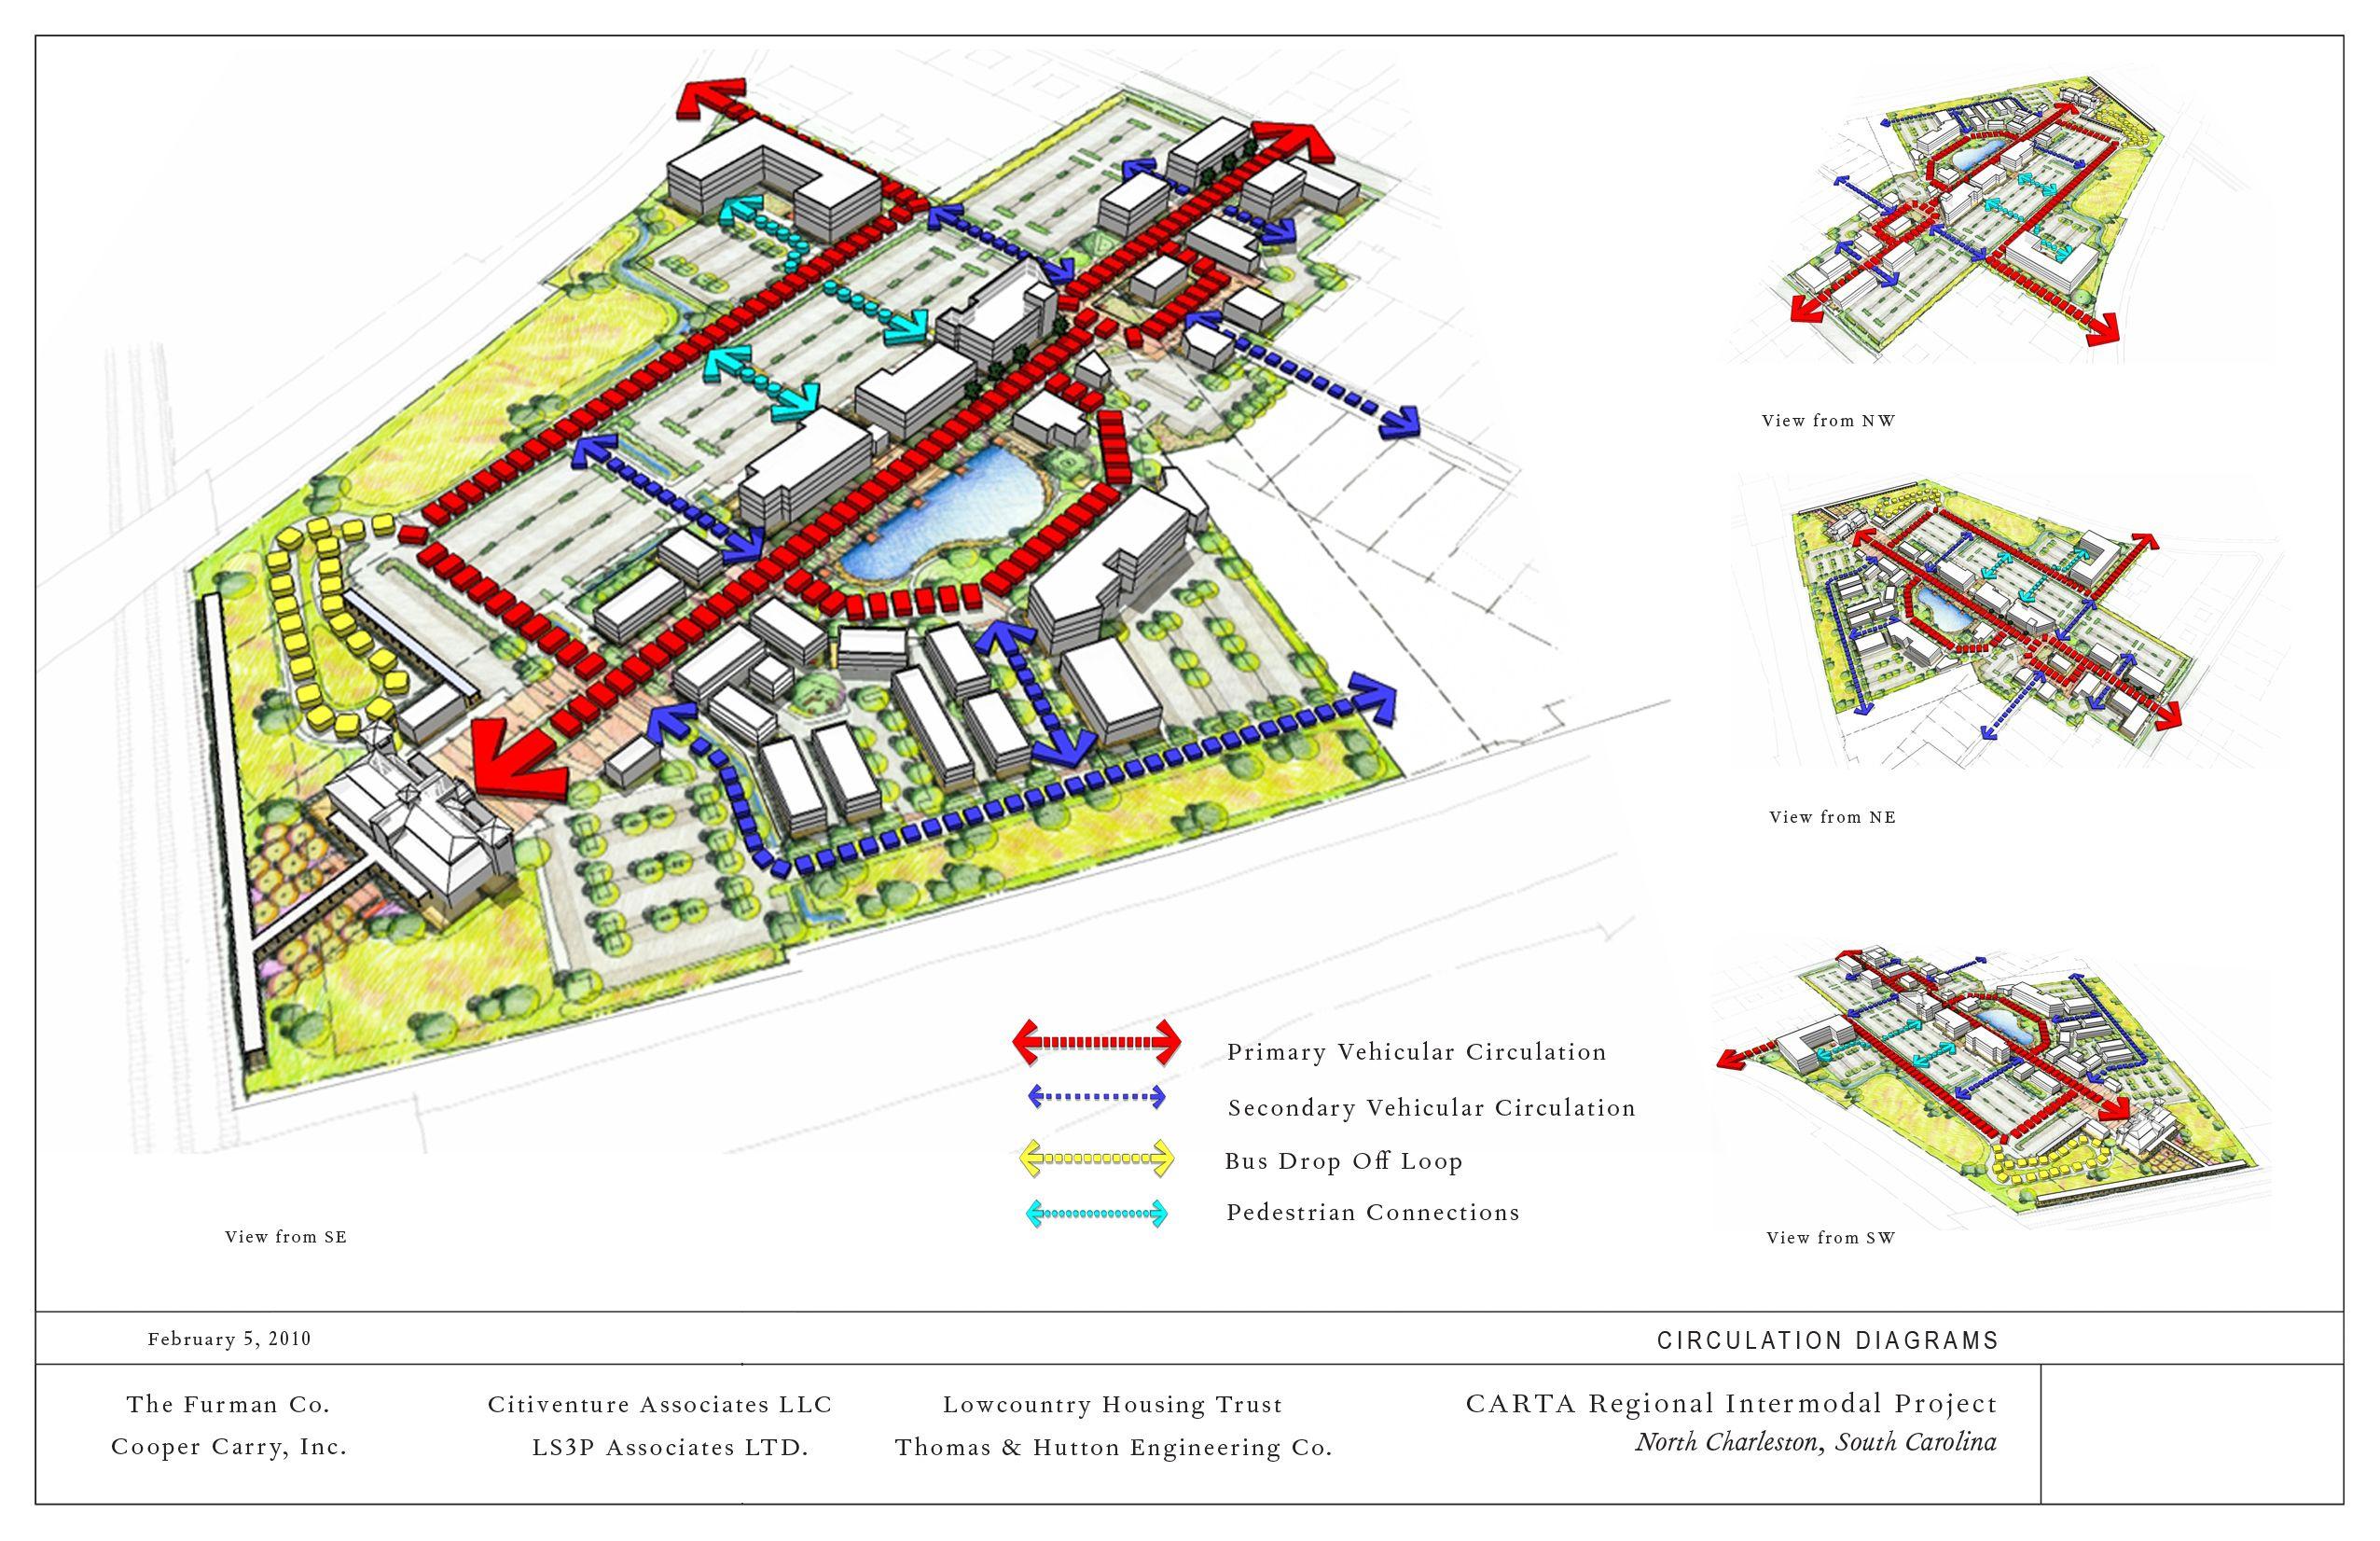 Architectural 3d Diagrams Circulation Diagram On 11x17 Border